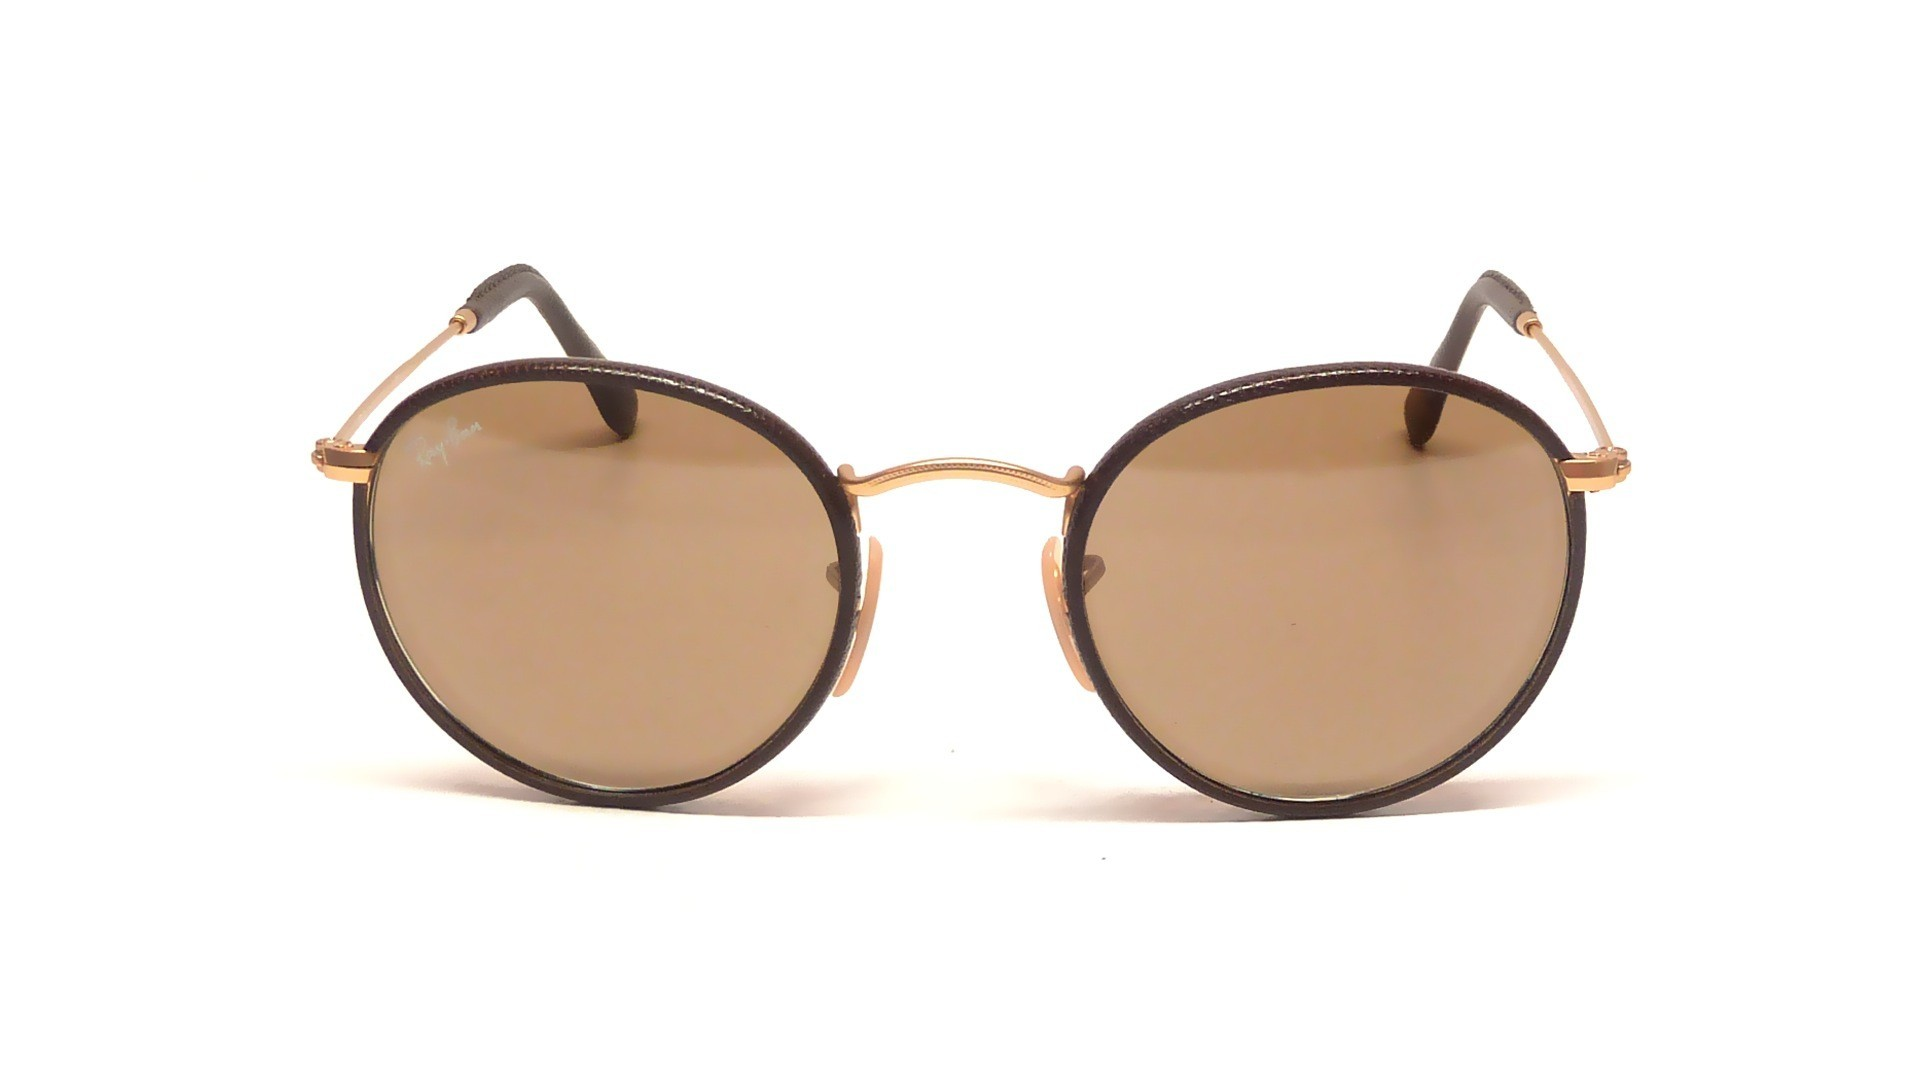 70590cf58d Sunglasses Ray-Ban Round Craft Brown RB3475Q 112 53 50-21 Medium